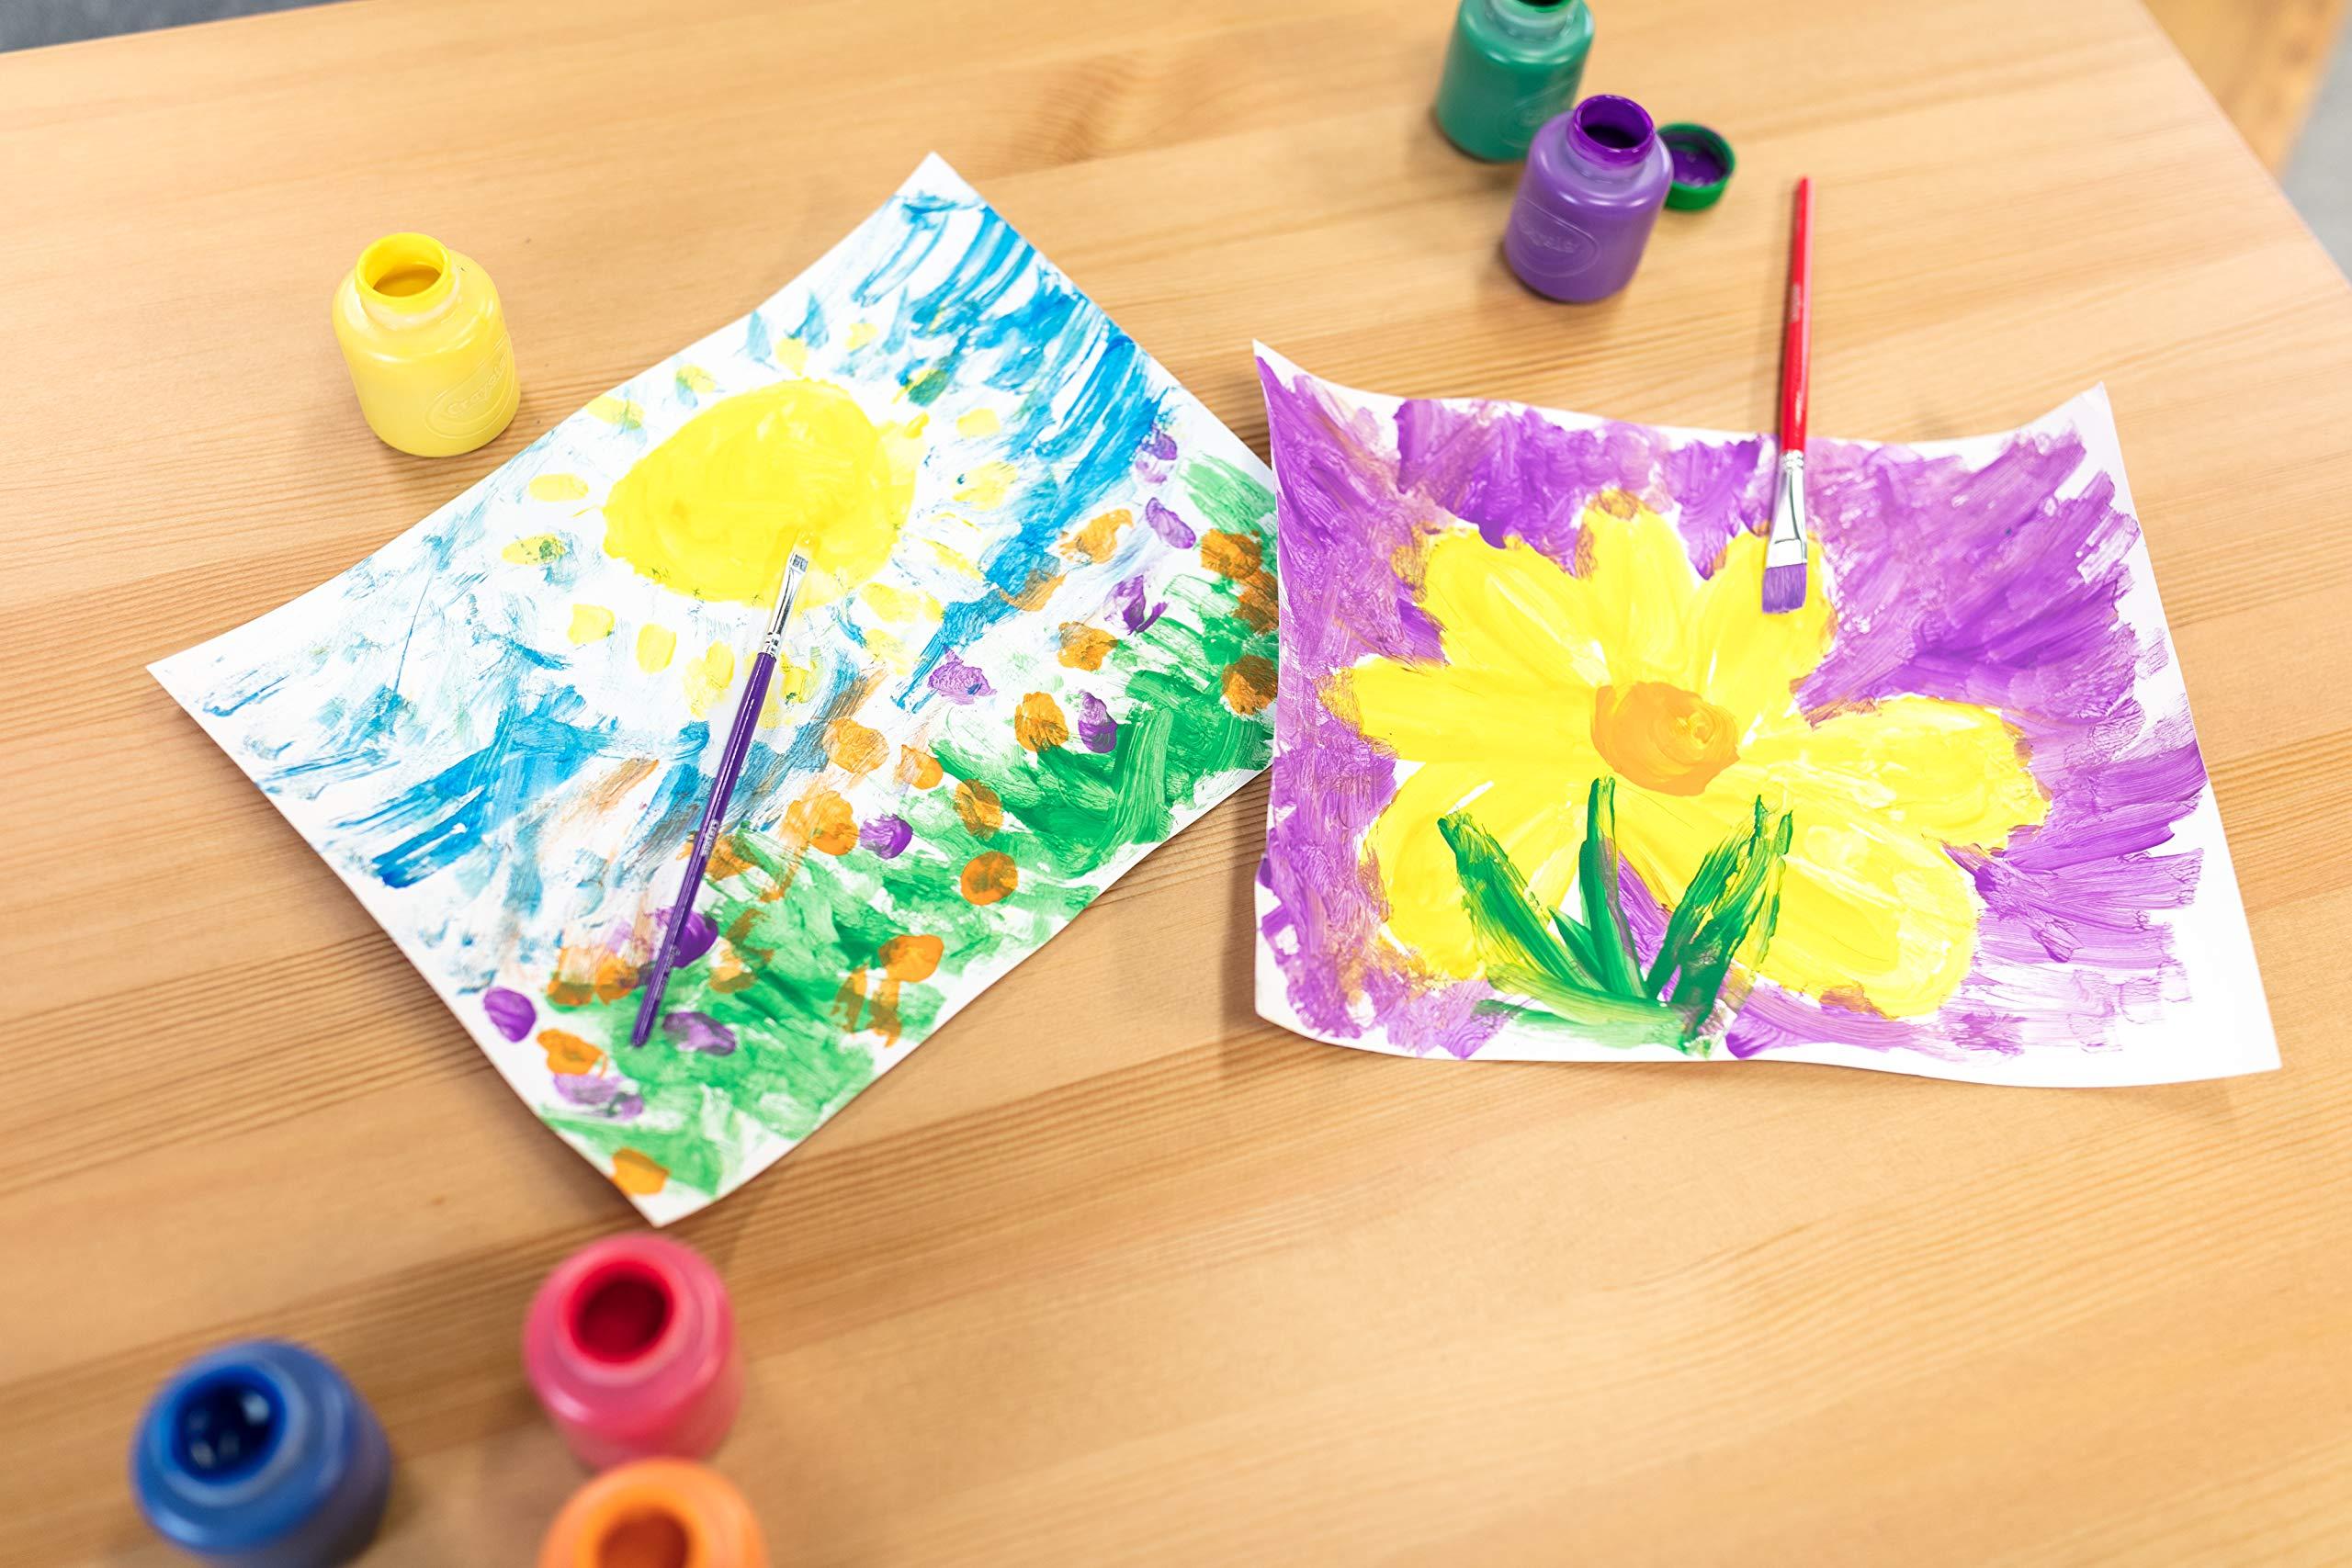 Pack of 4 Multi Crayola Washable Ready Mix Kids Paint